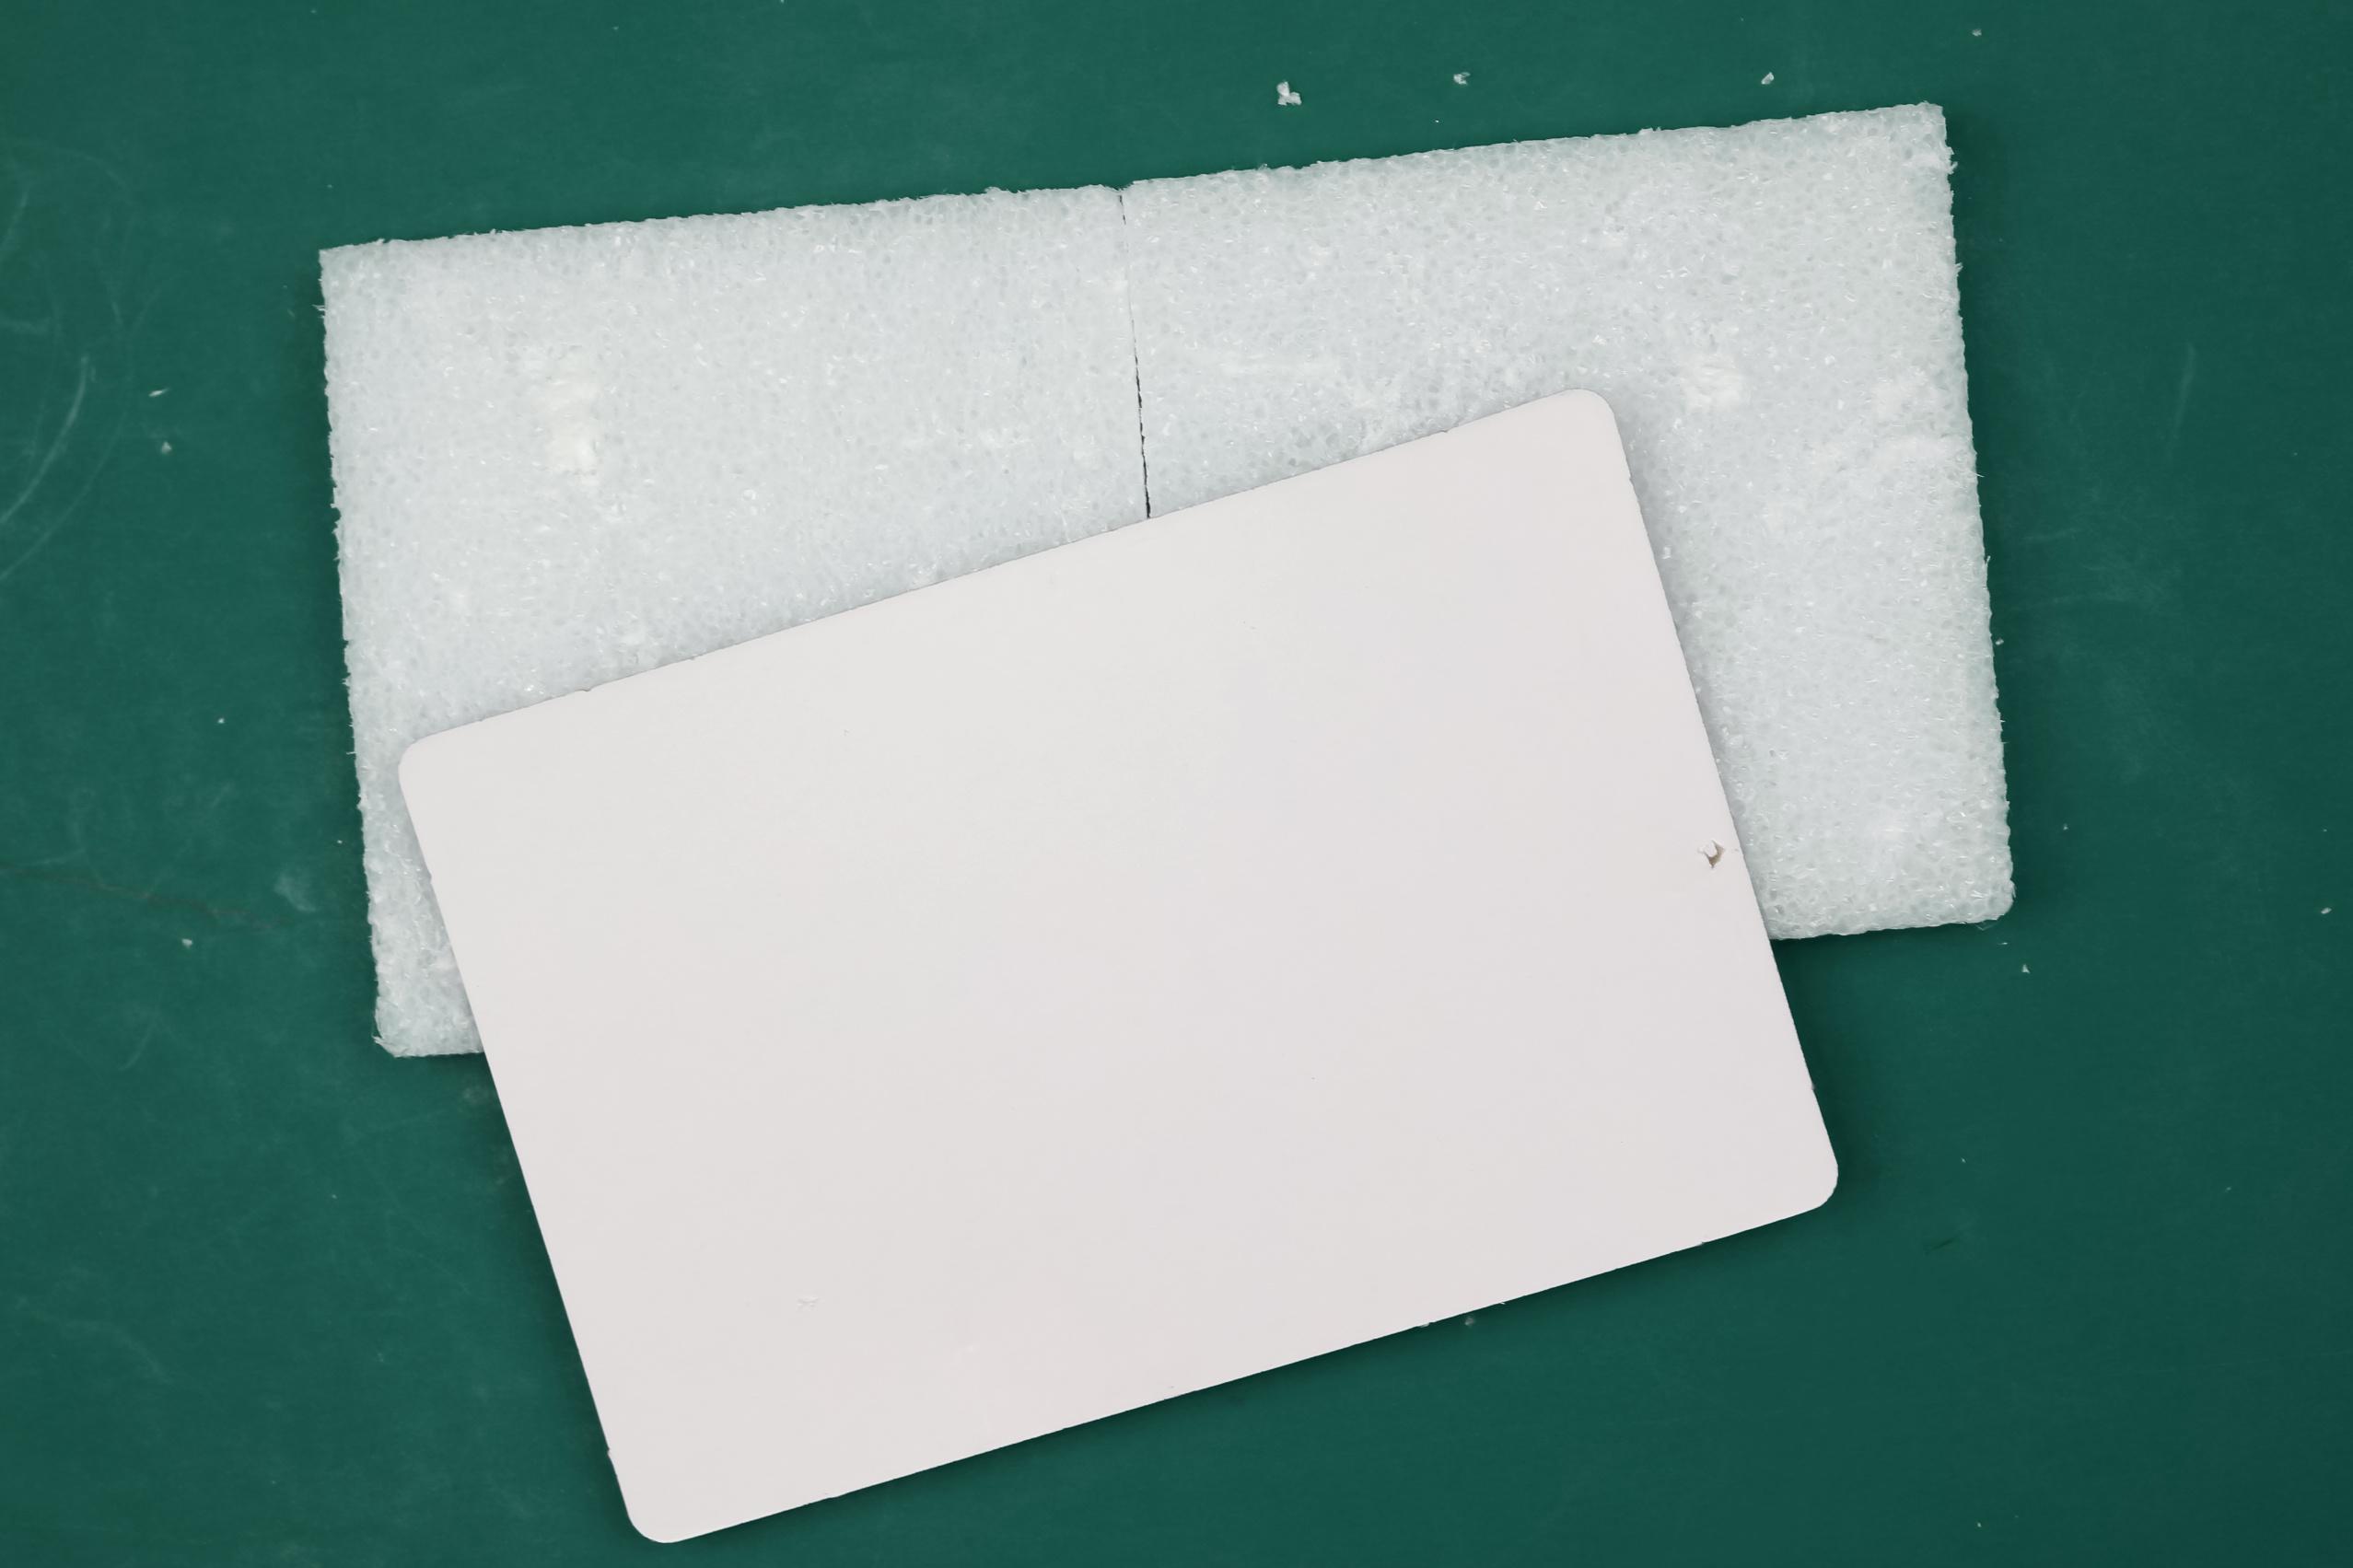 White styrofoam on a green background